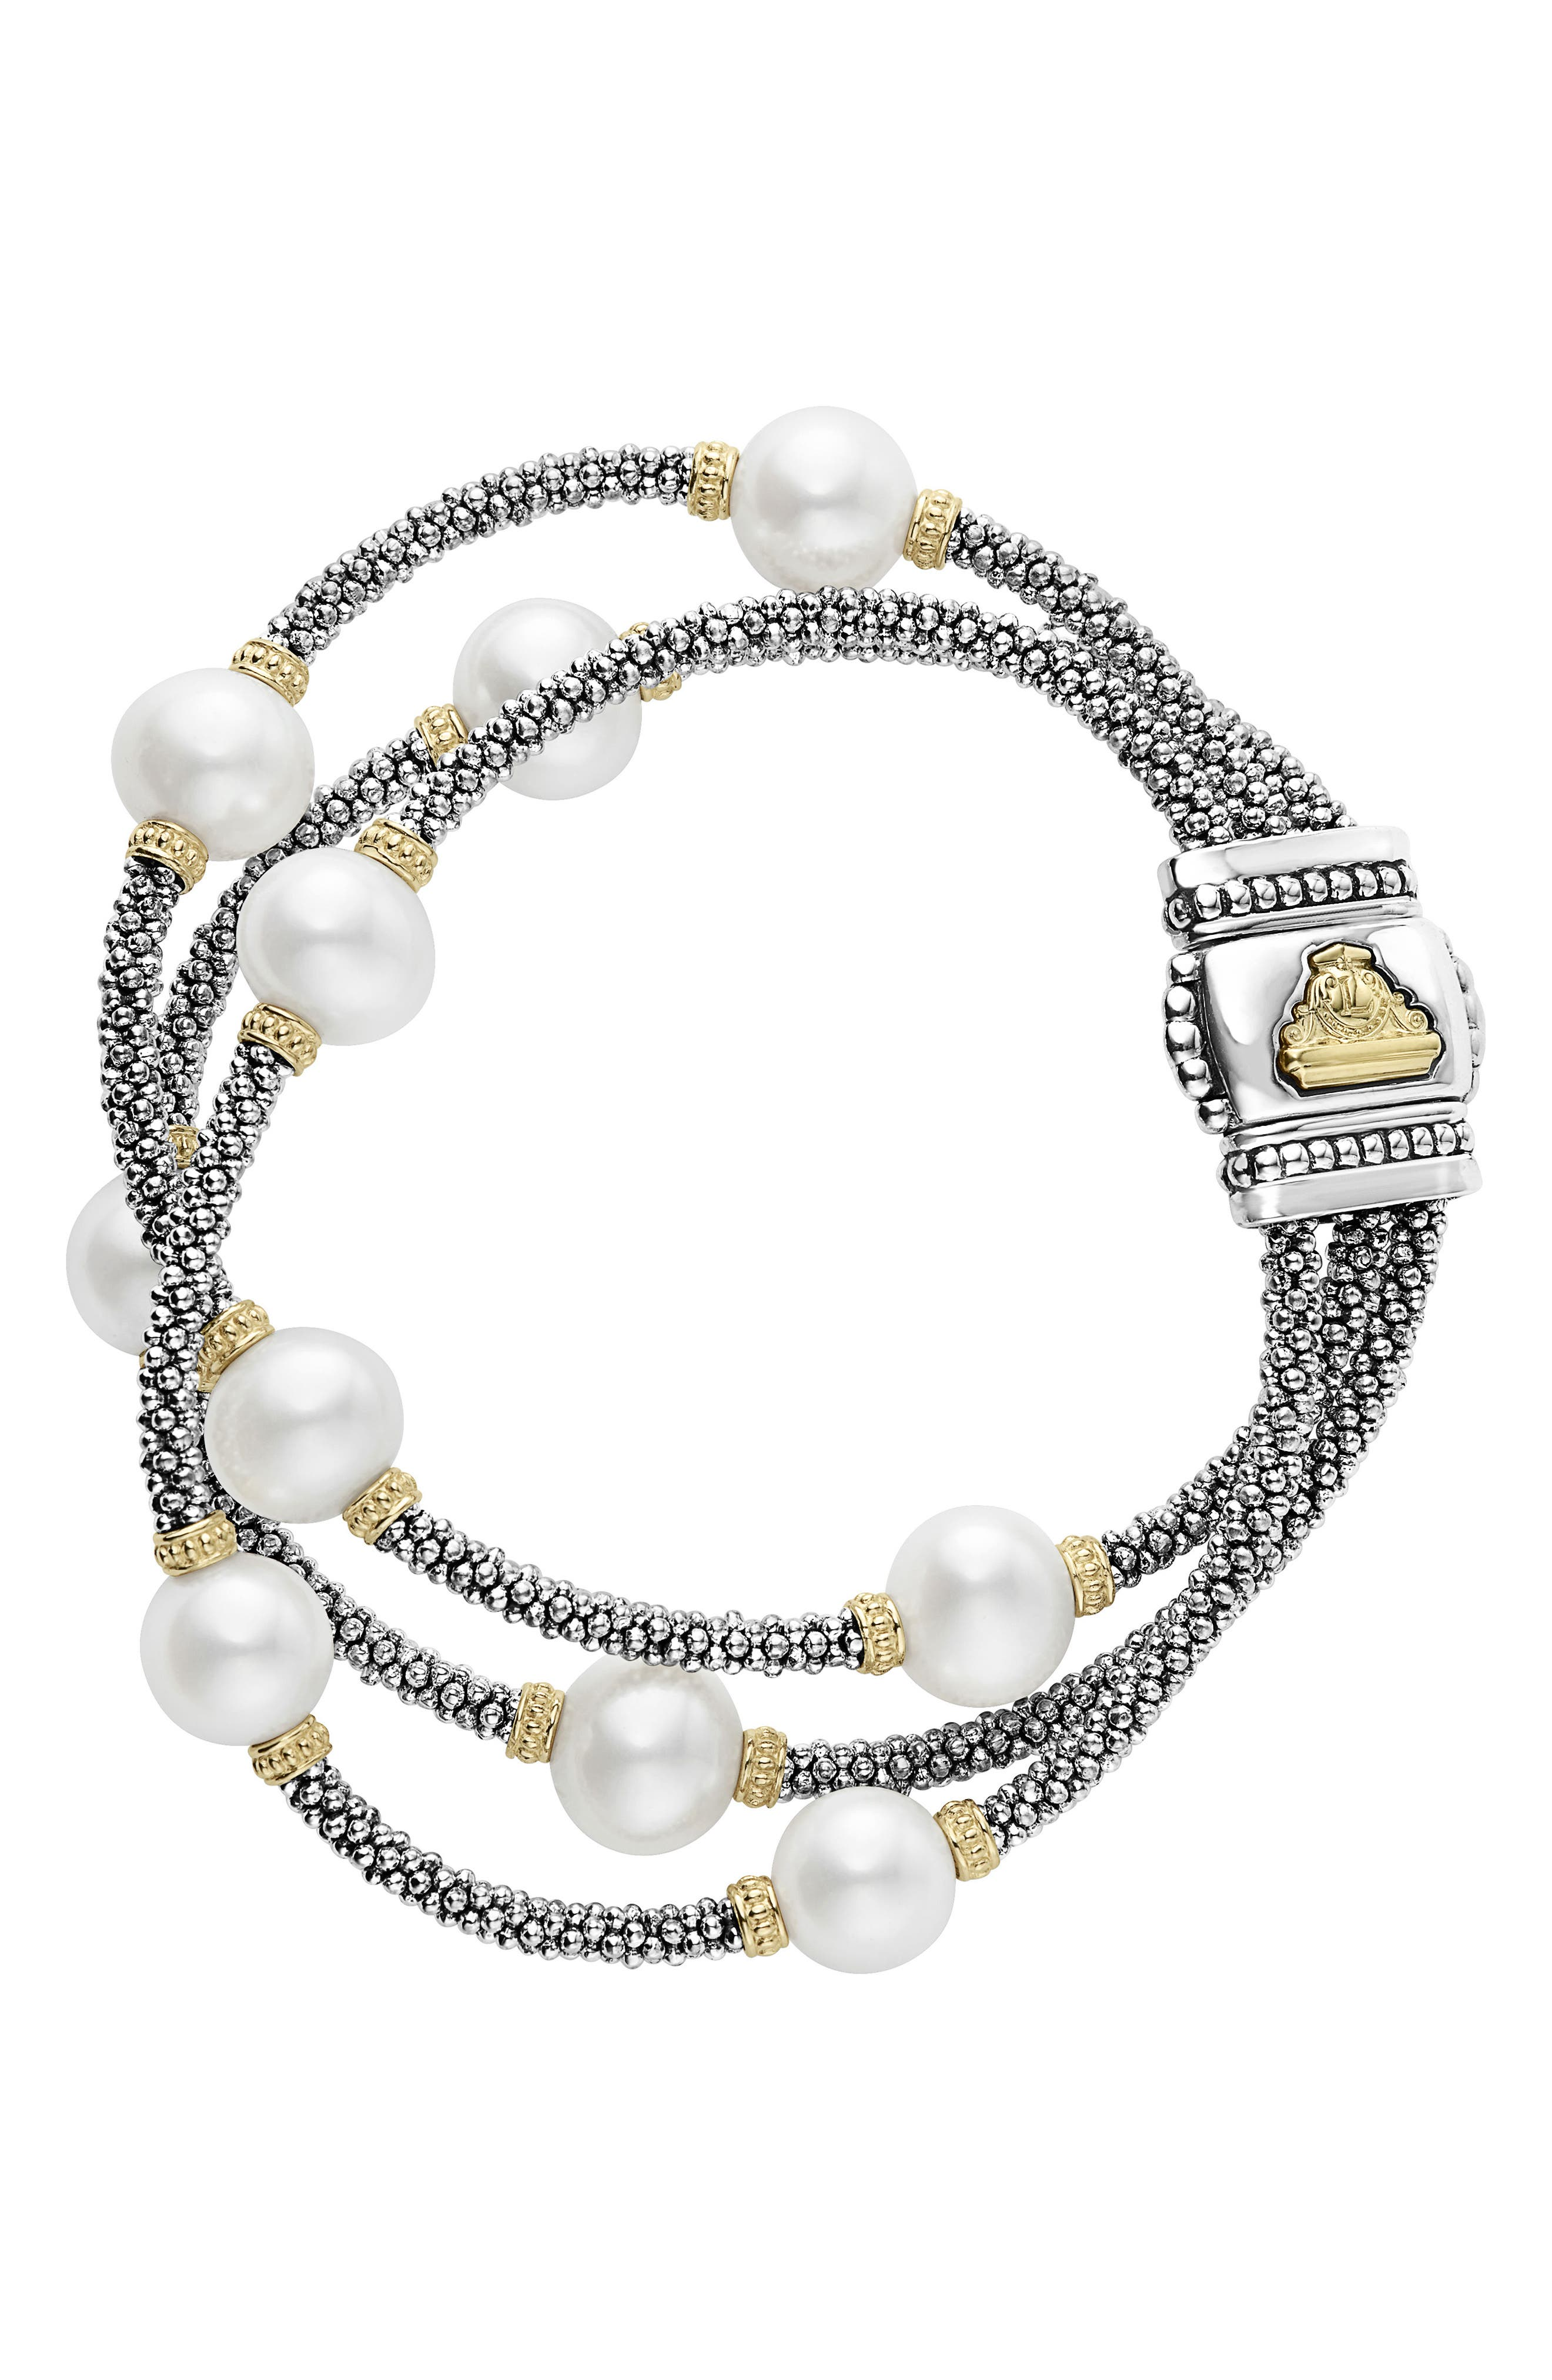 Luna Pearl Caviar Multistrand Bracelet,                         Main,                         color, Silver/ Pearl